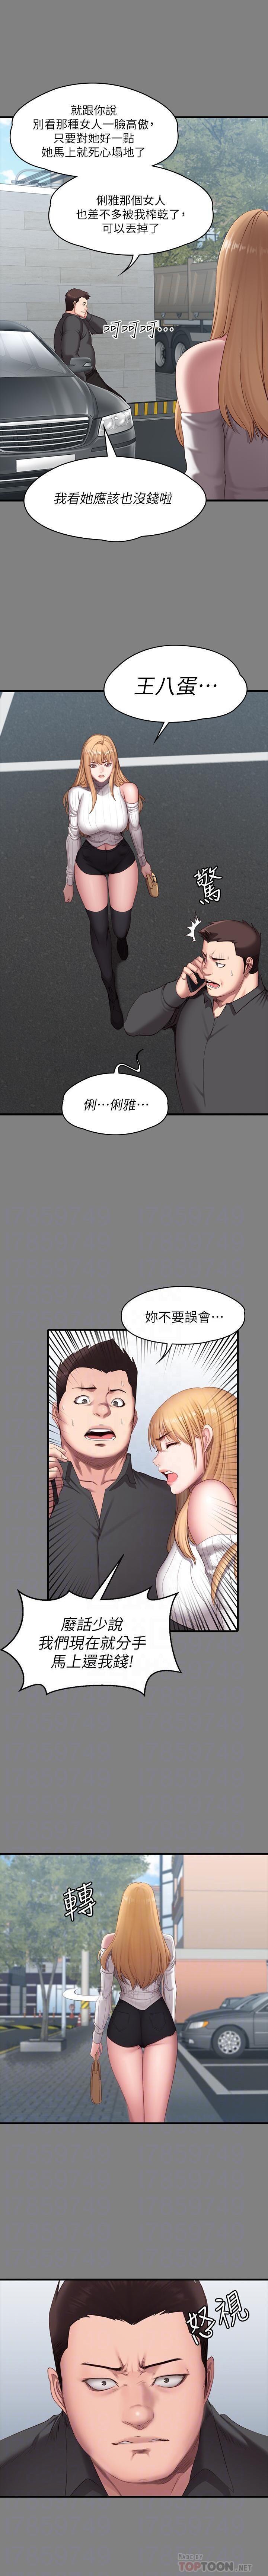 FITNESS 61-88 CHI 9